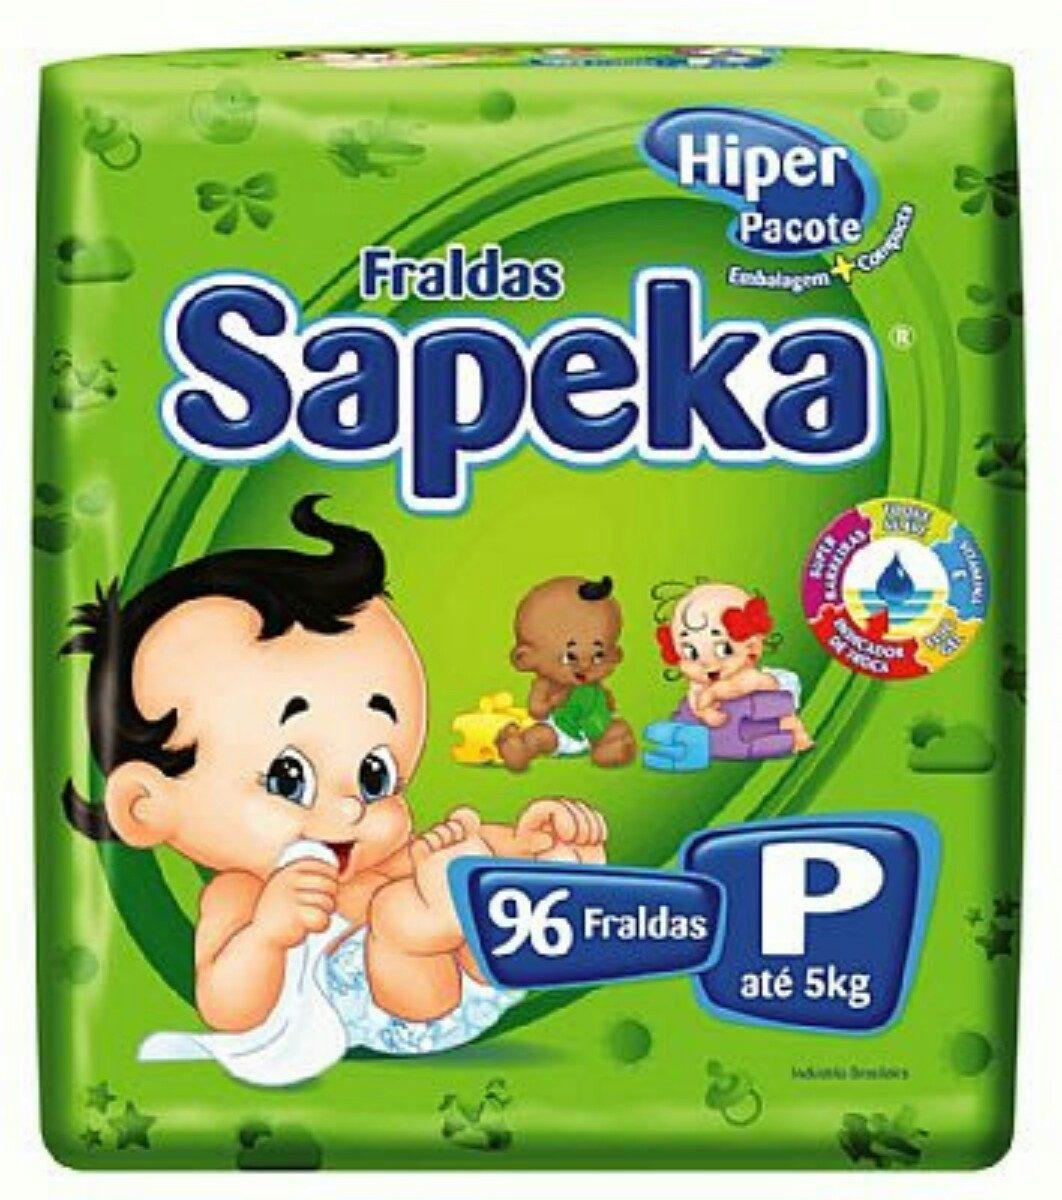 2f8655b5d Fralda Sapeka Hiper P ( 96 Fraldas ) - R  59